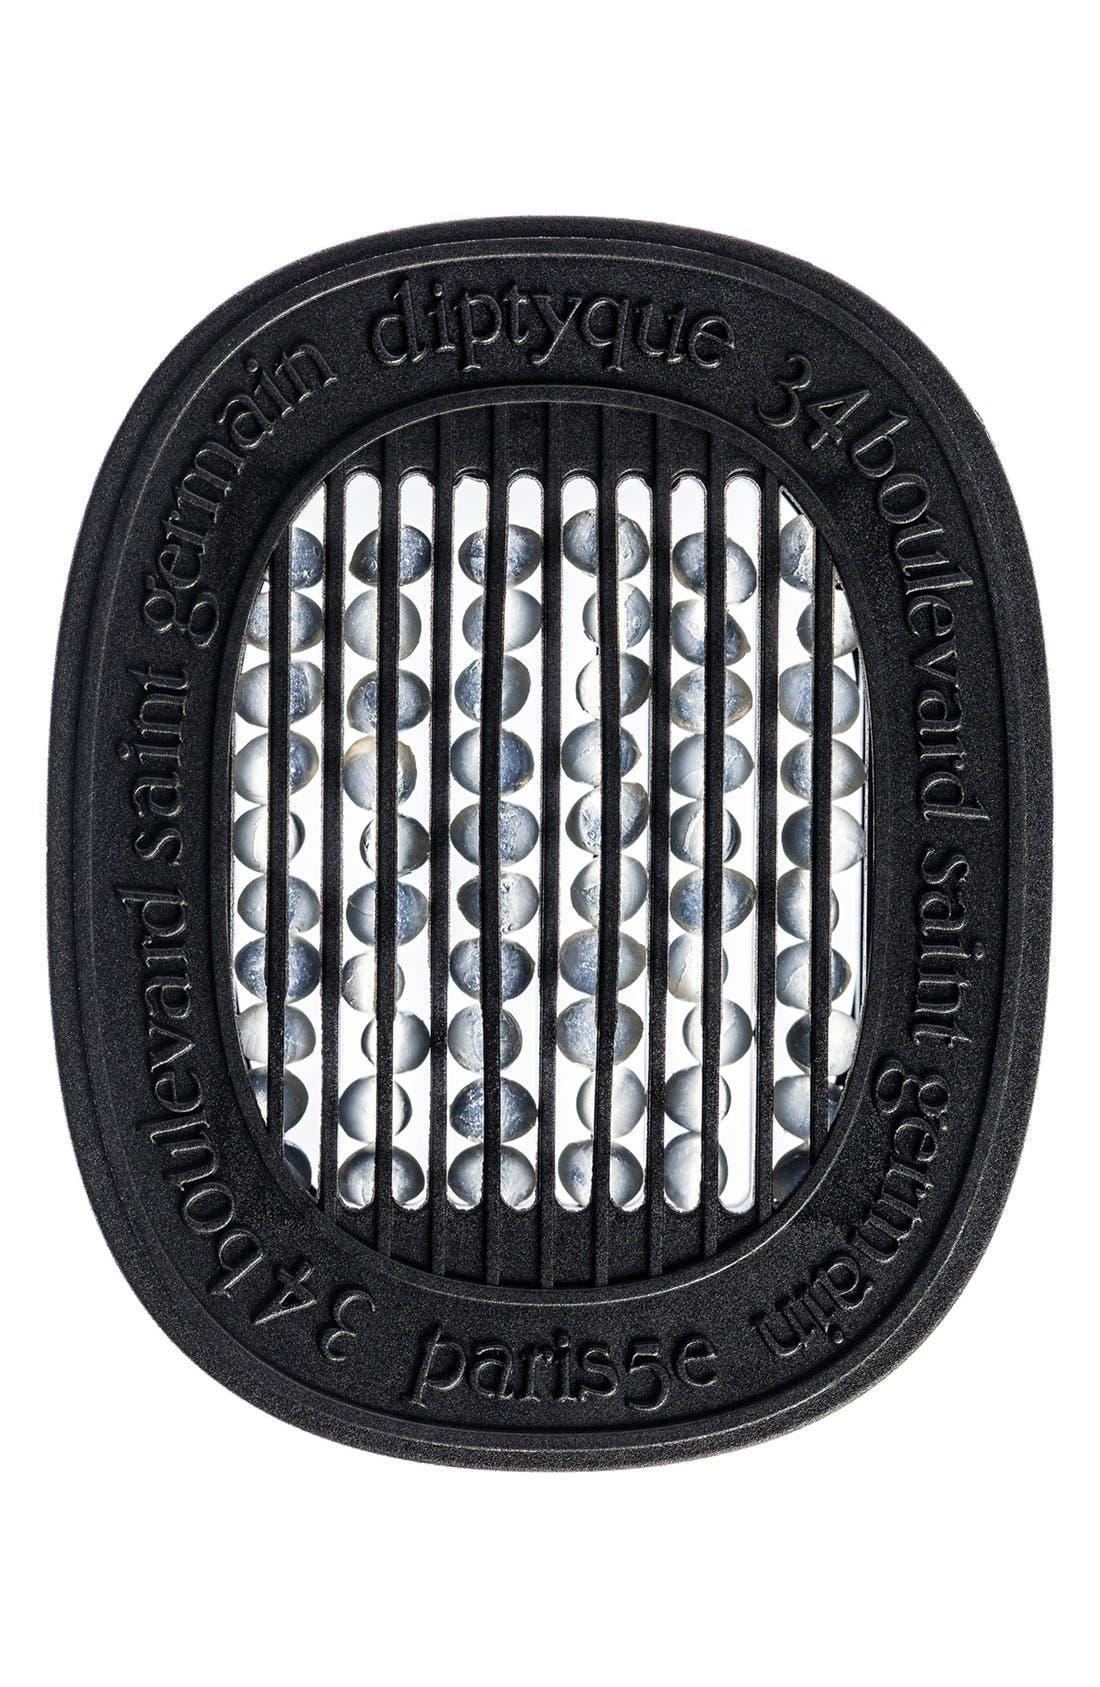 diptyque 'Roses' Electric Diffuser Refill Capsule